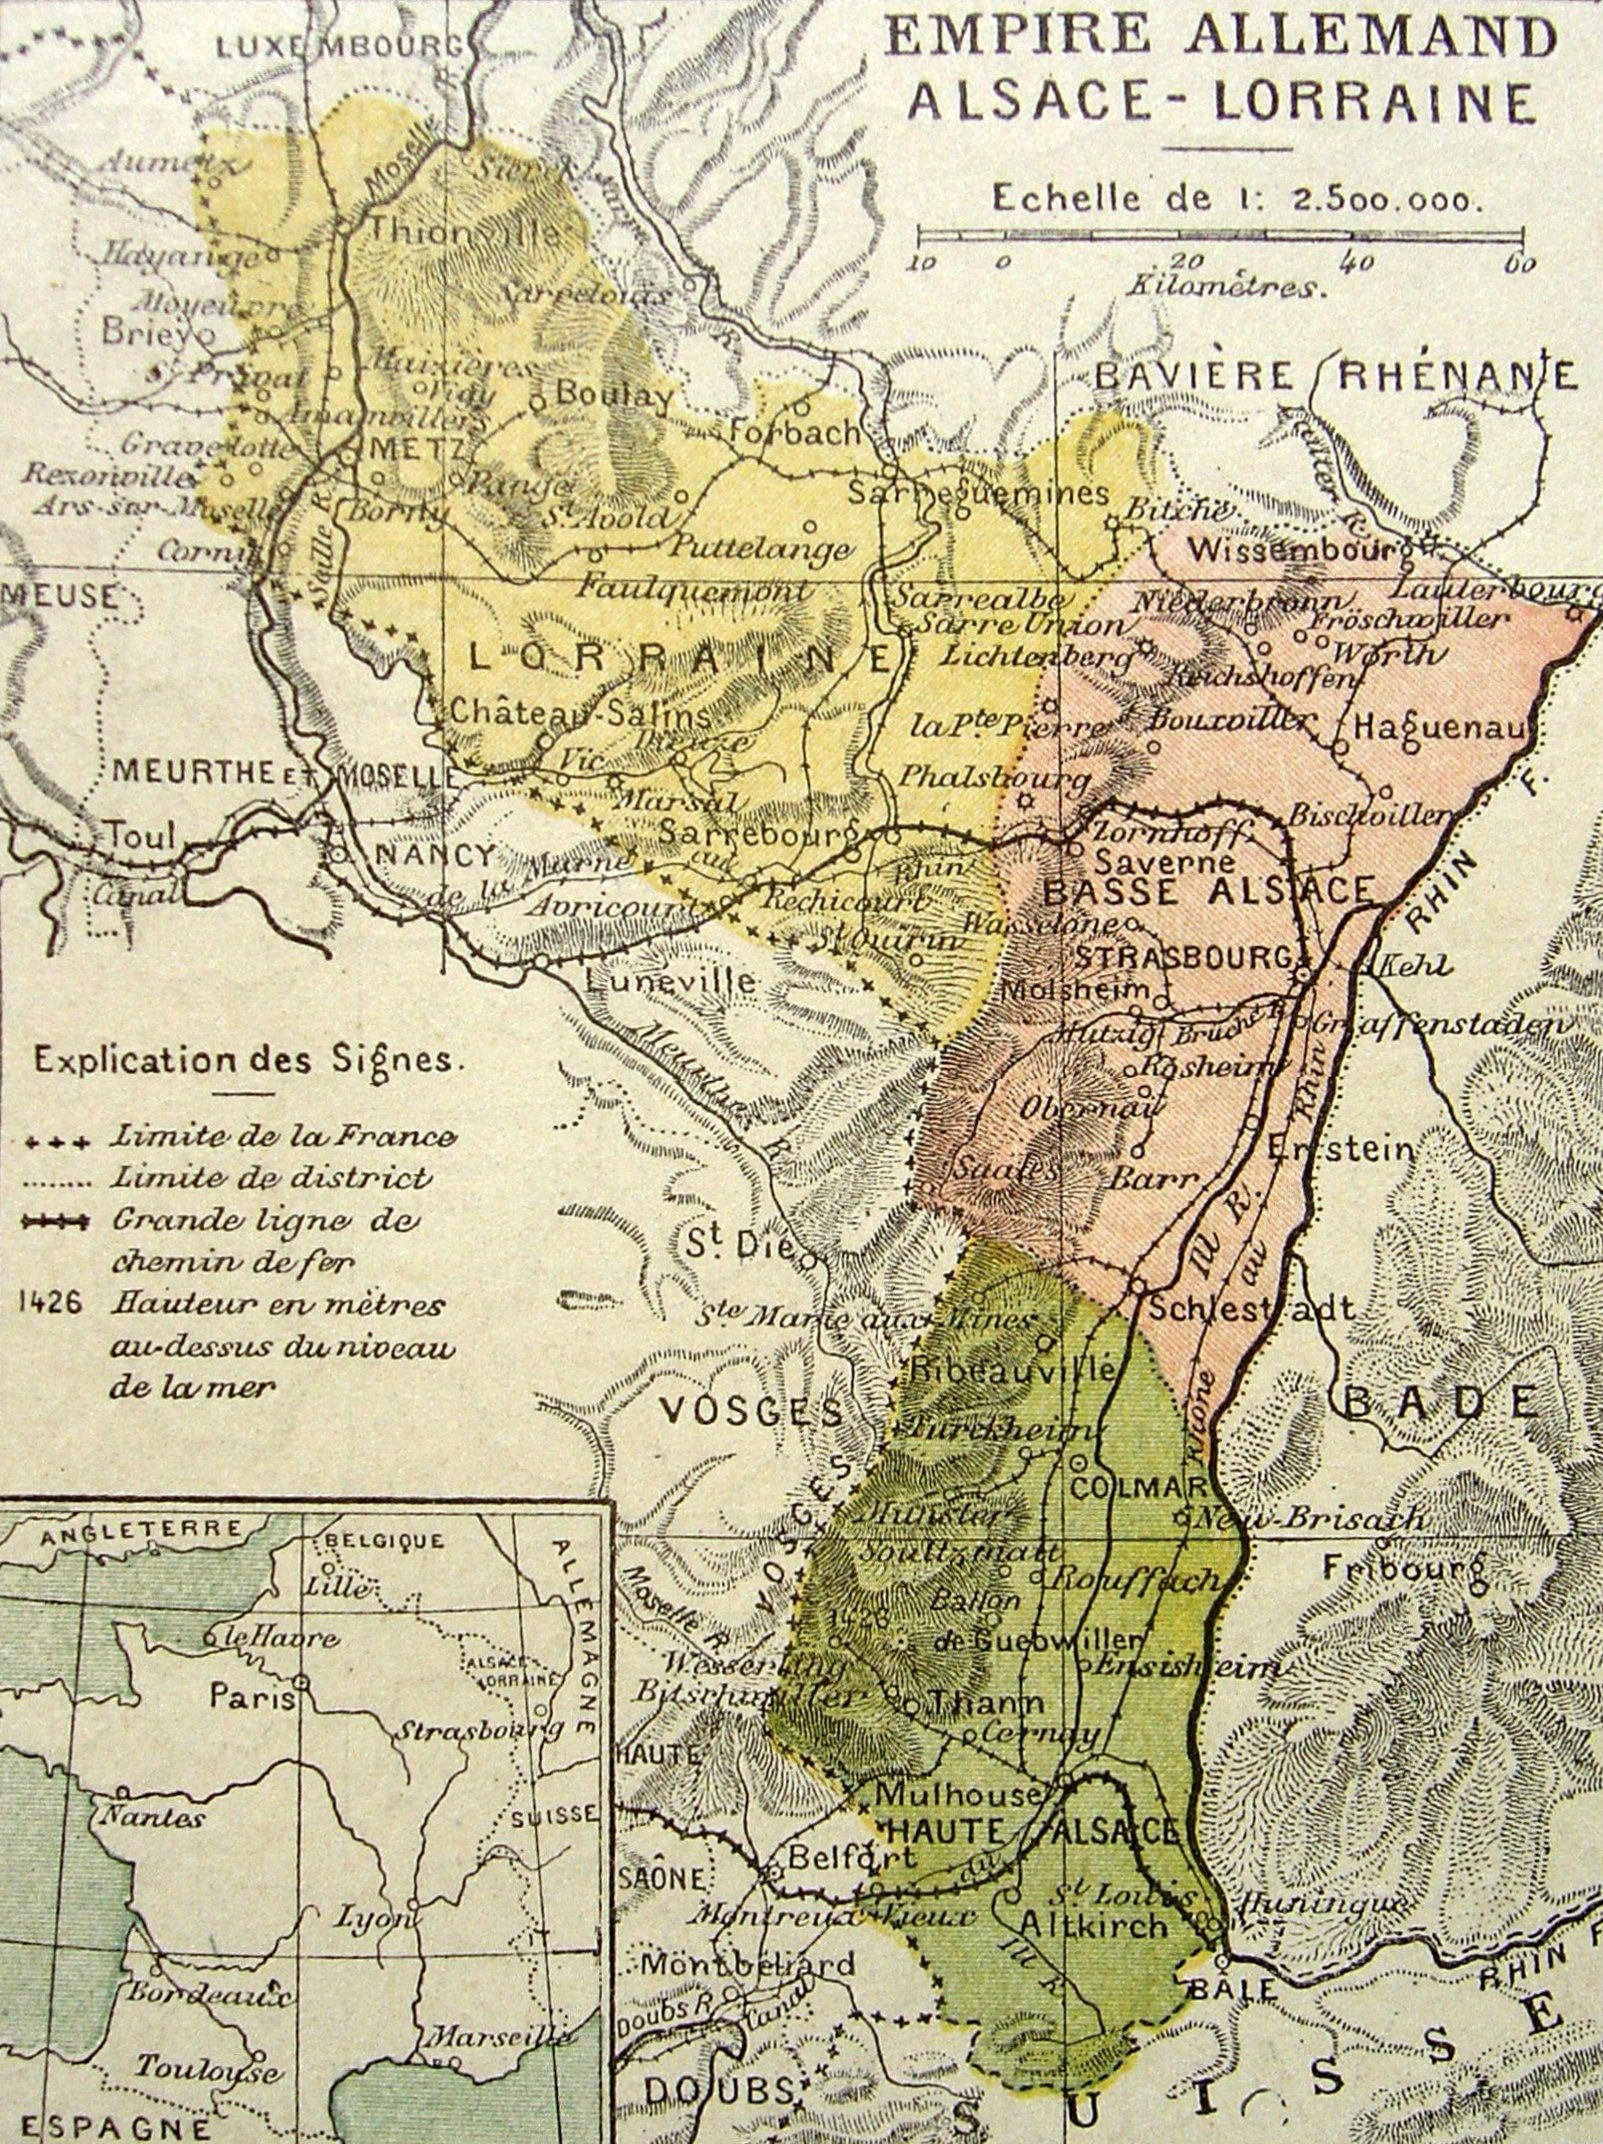 Carte Lalsace.Carte De L Alsace Lorraine En 1914 Historical Maps Alsacia Mapa